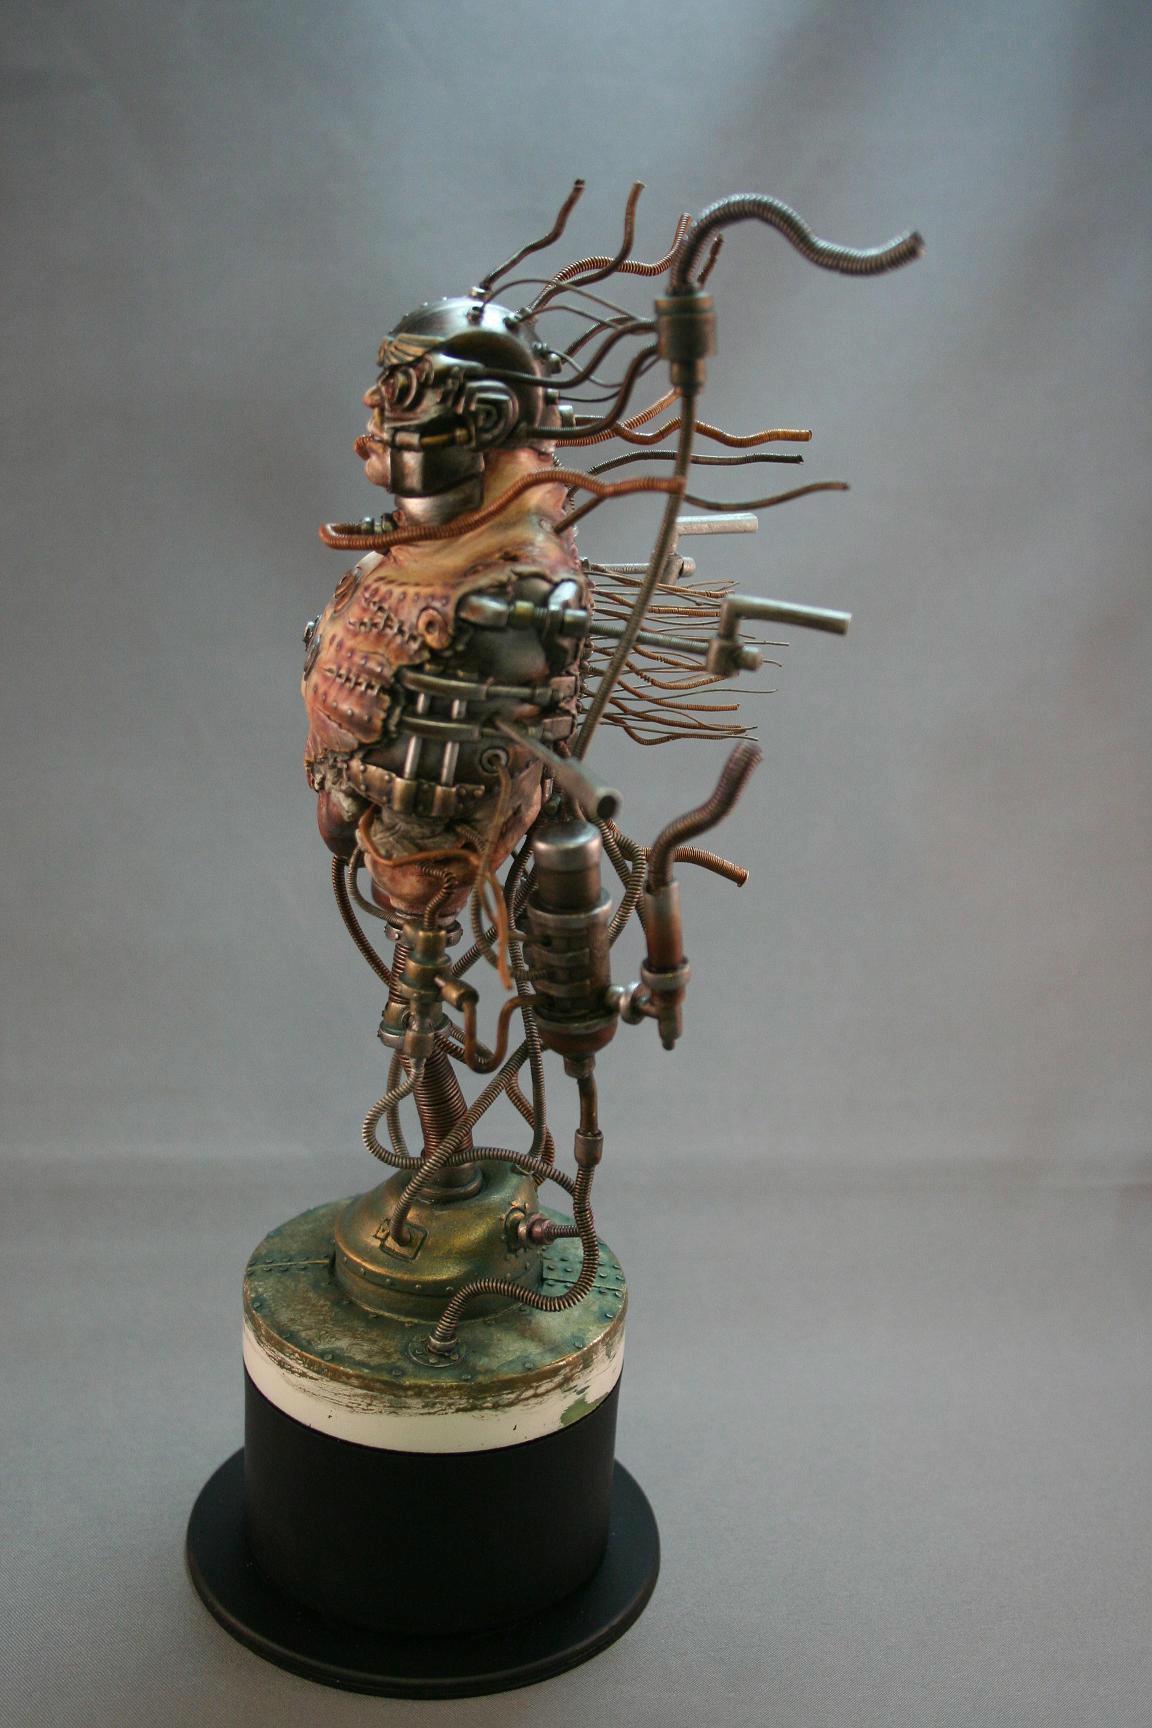 Dreadnought, Pilot, Sculpting, Space Marines, Warhammer 40,000